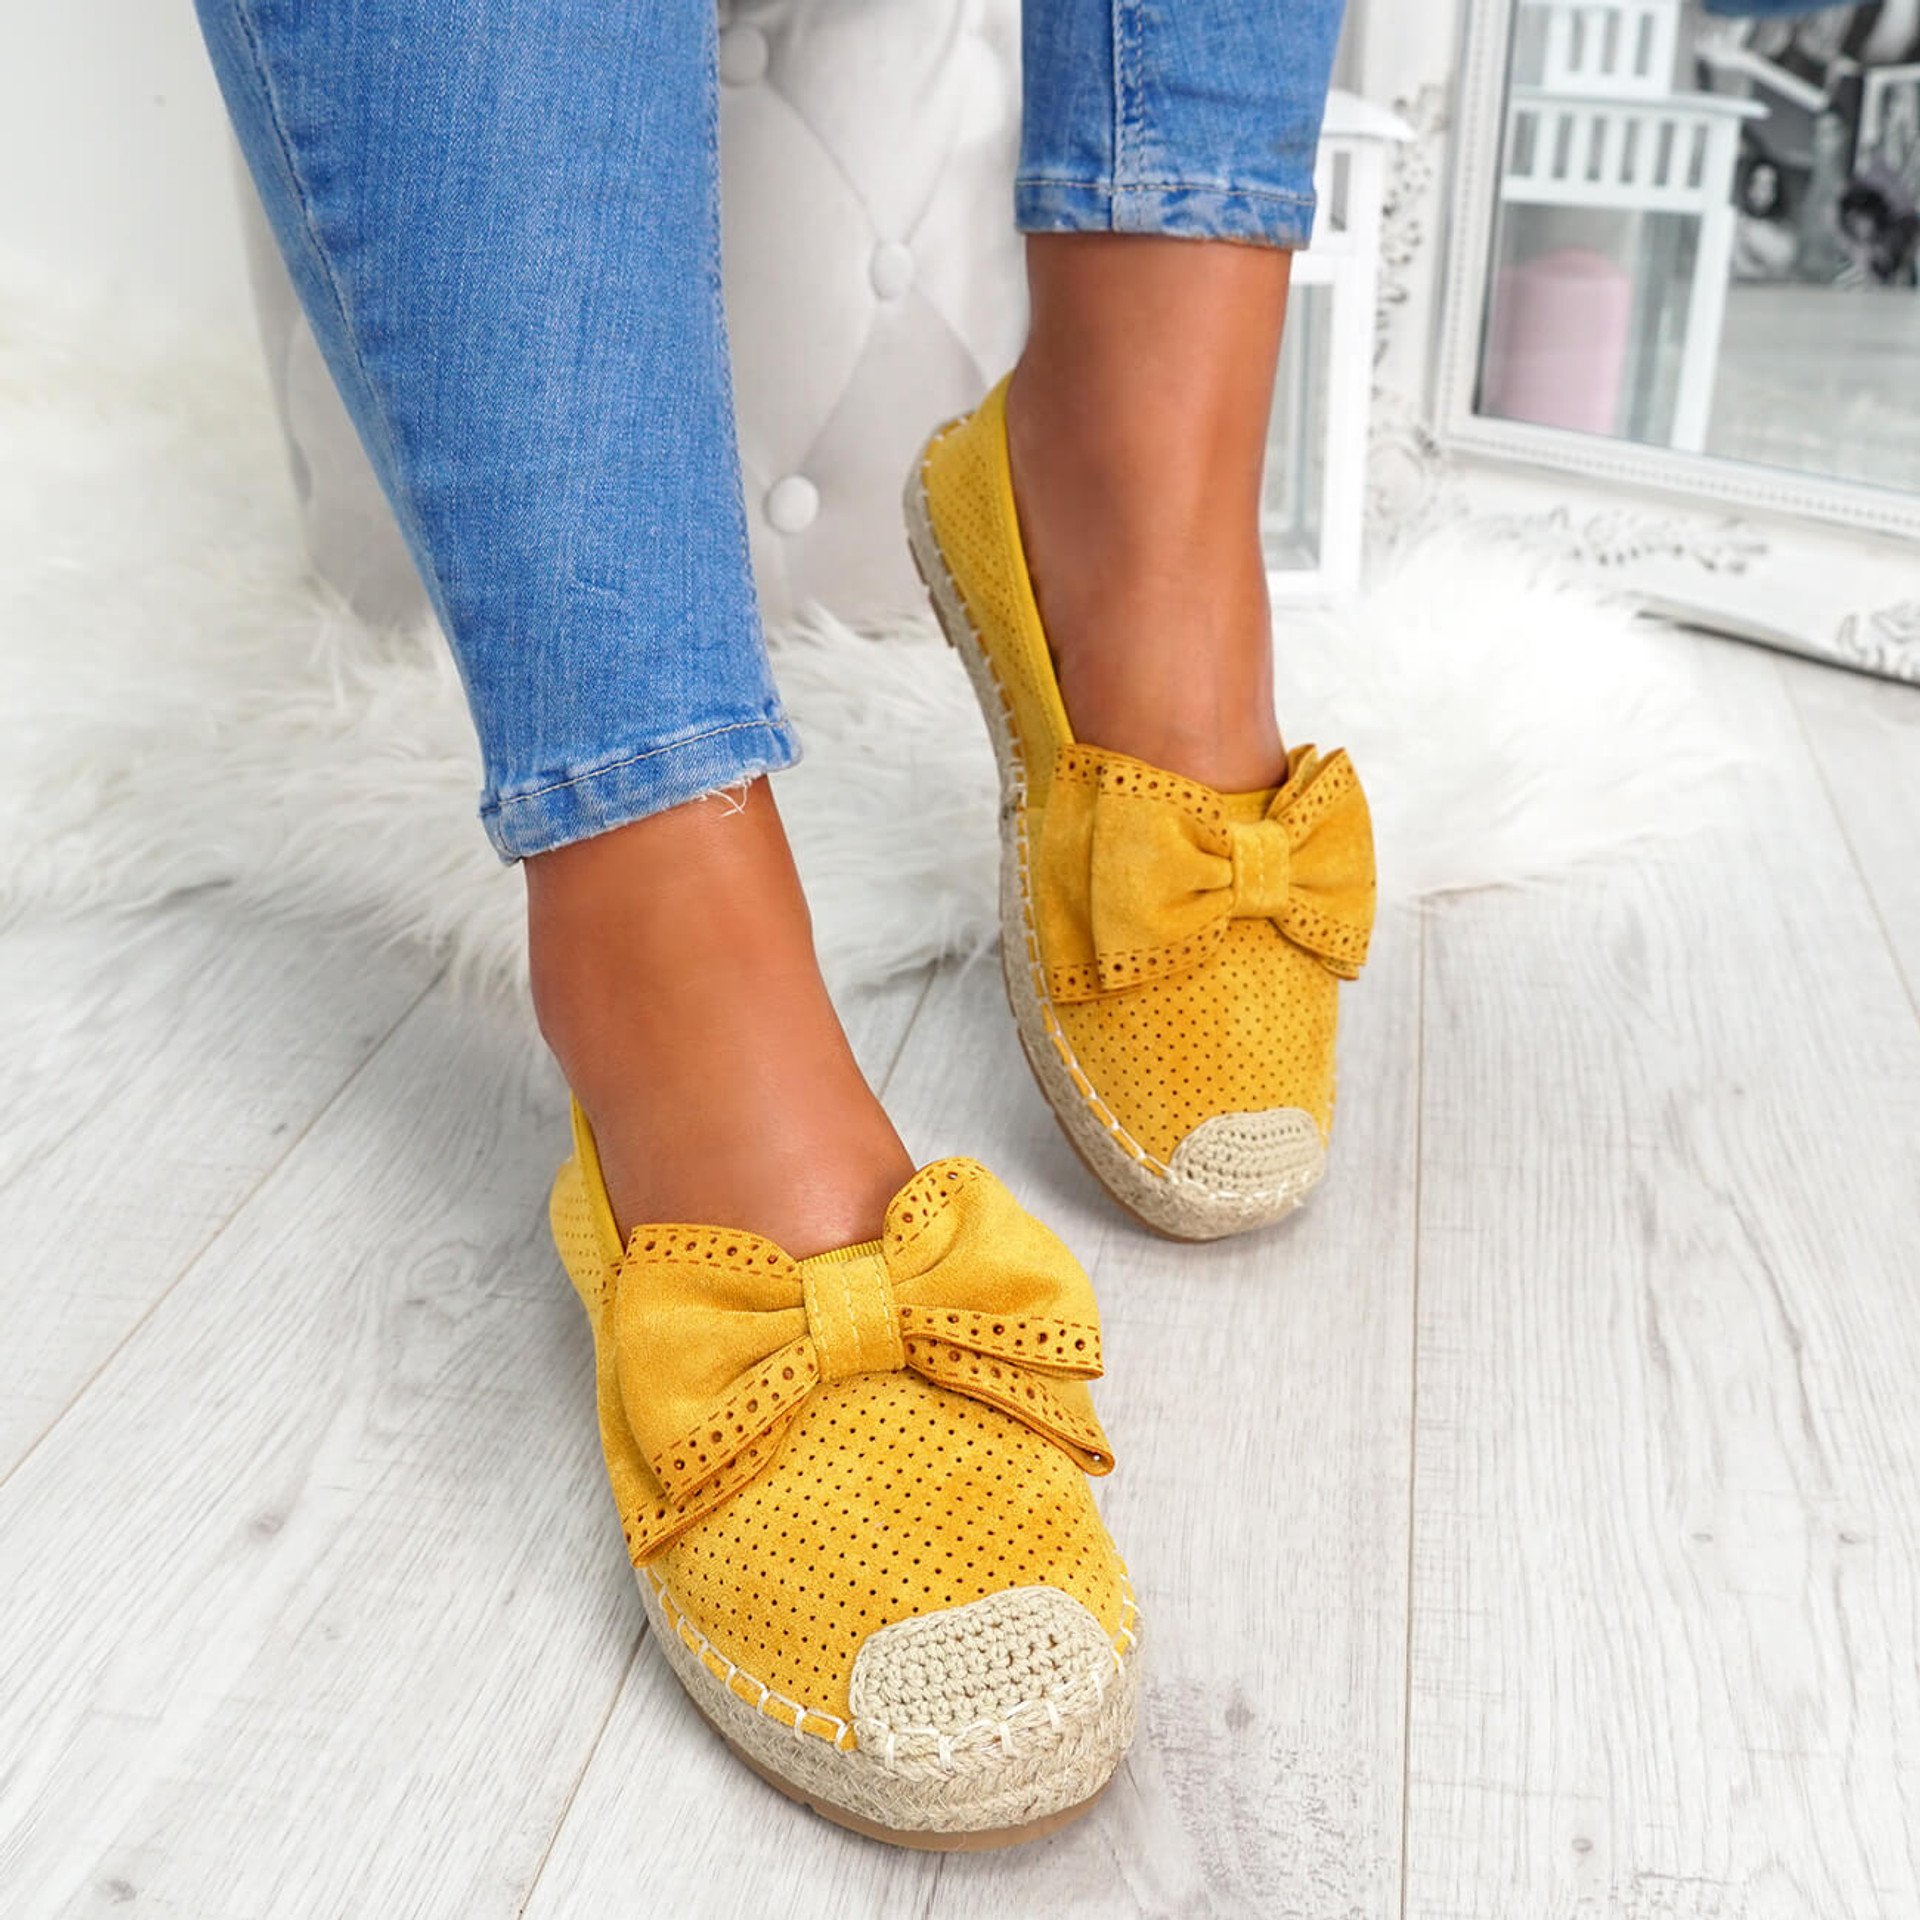 womens yellow bow espadrille ballerinas size uk 3 4 5 6 7 8